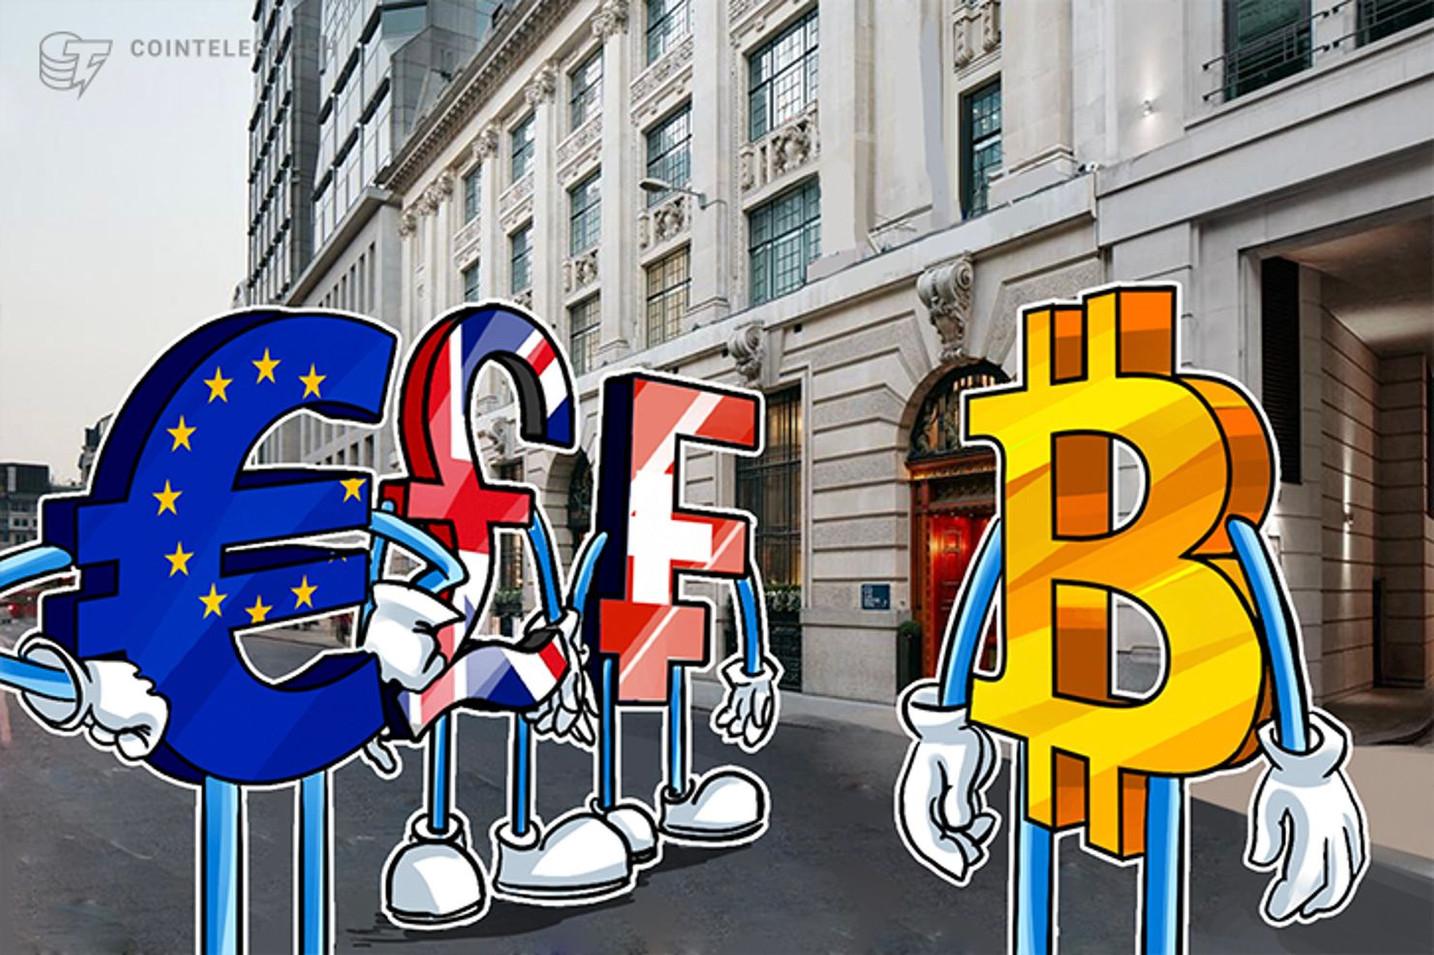 ECBドラギ総裁、仮想通貨やビットコインに否定的な見解|一方「ユーロはいつでもユーロ」と楽観的